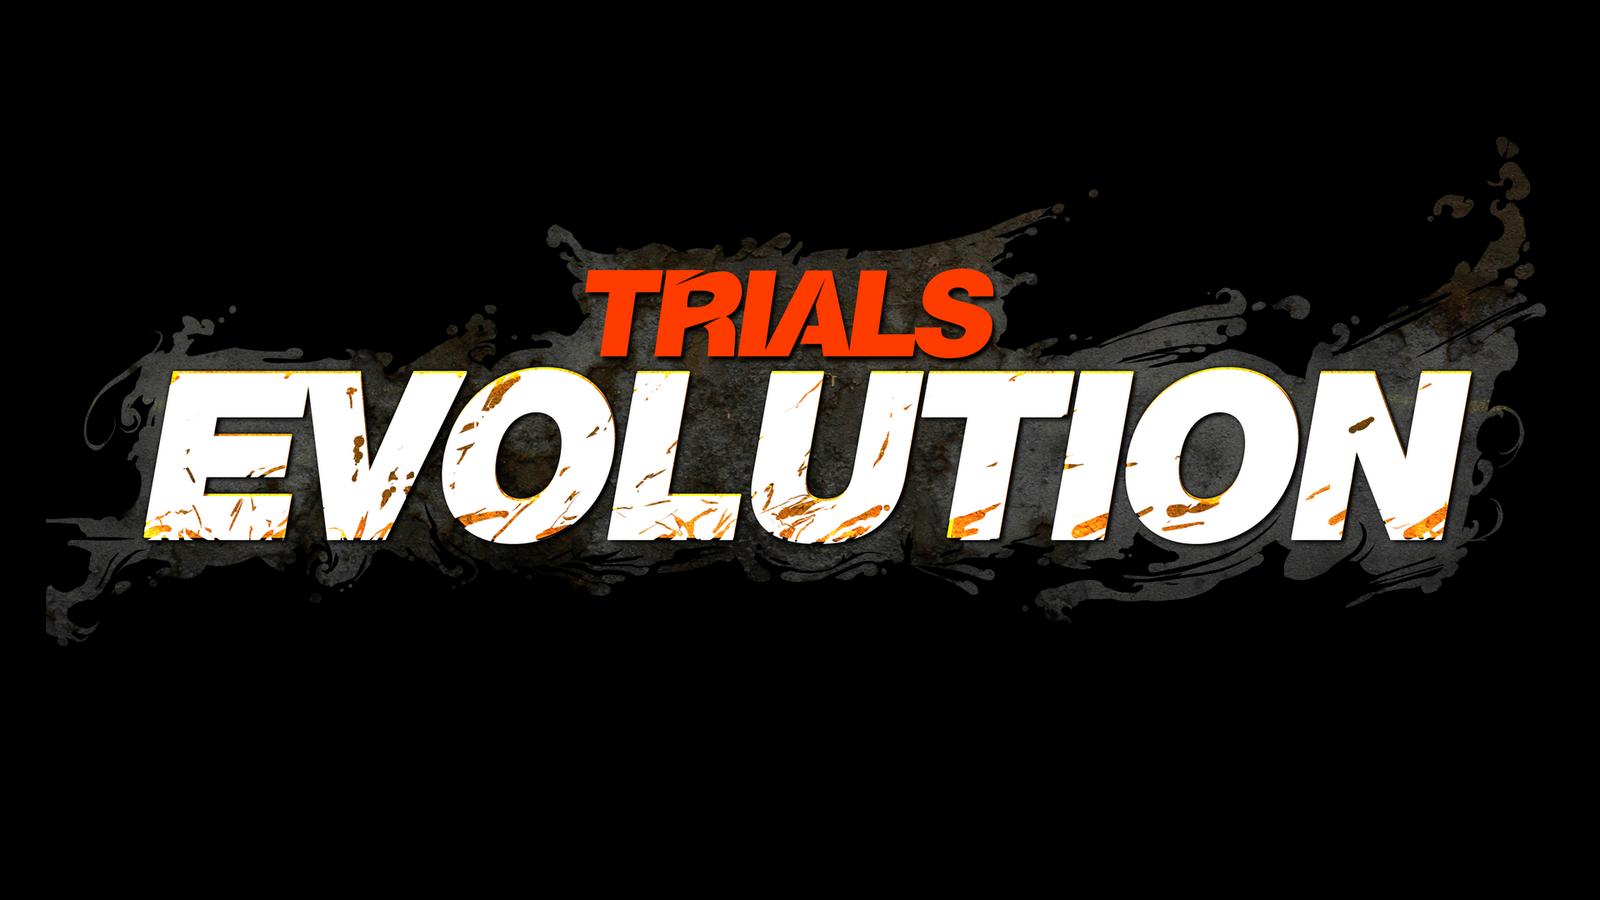 http://3.bp.blogspot.com/-FG_HYec_nZg/UBY11V7wGXI/AAAAAAAAGnU/ZoDE_cHEgbo/s1600/Trials.png